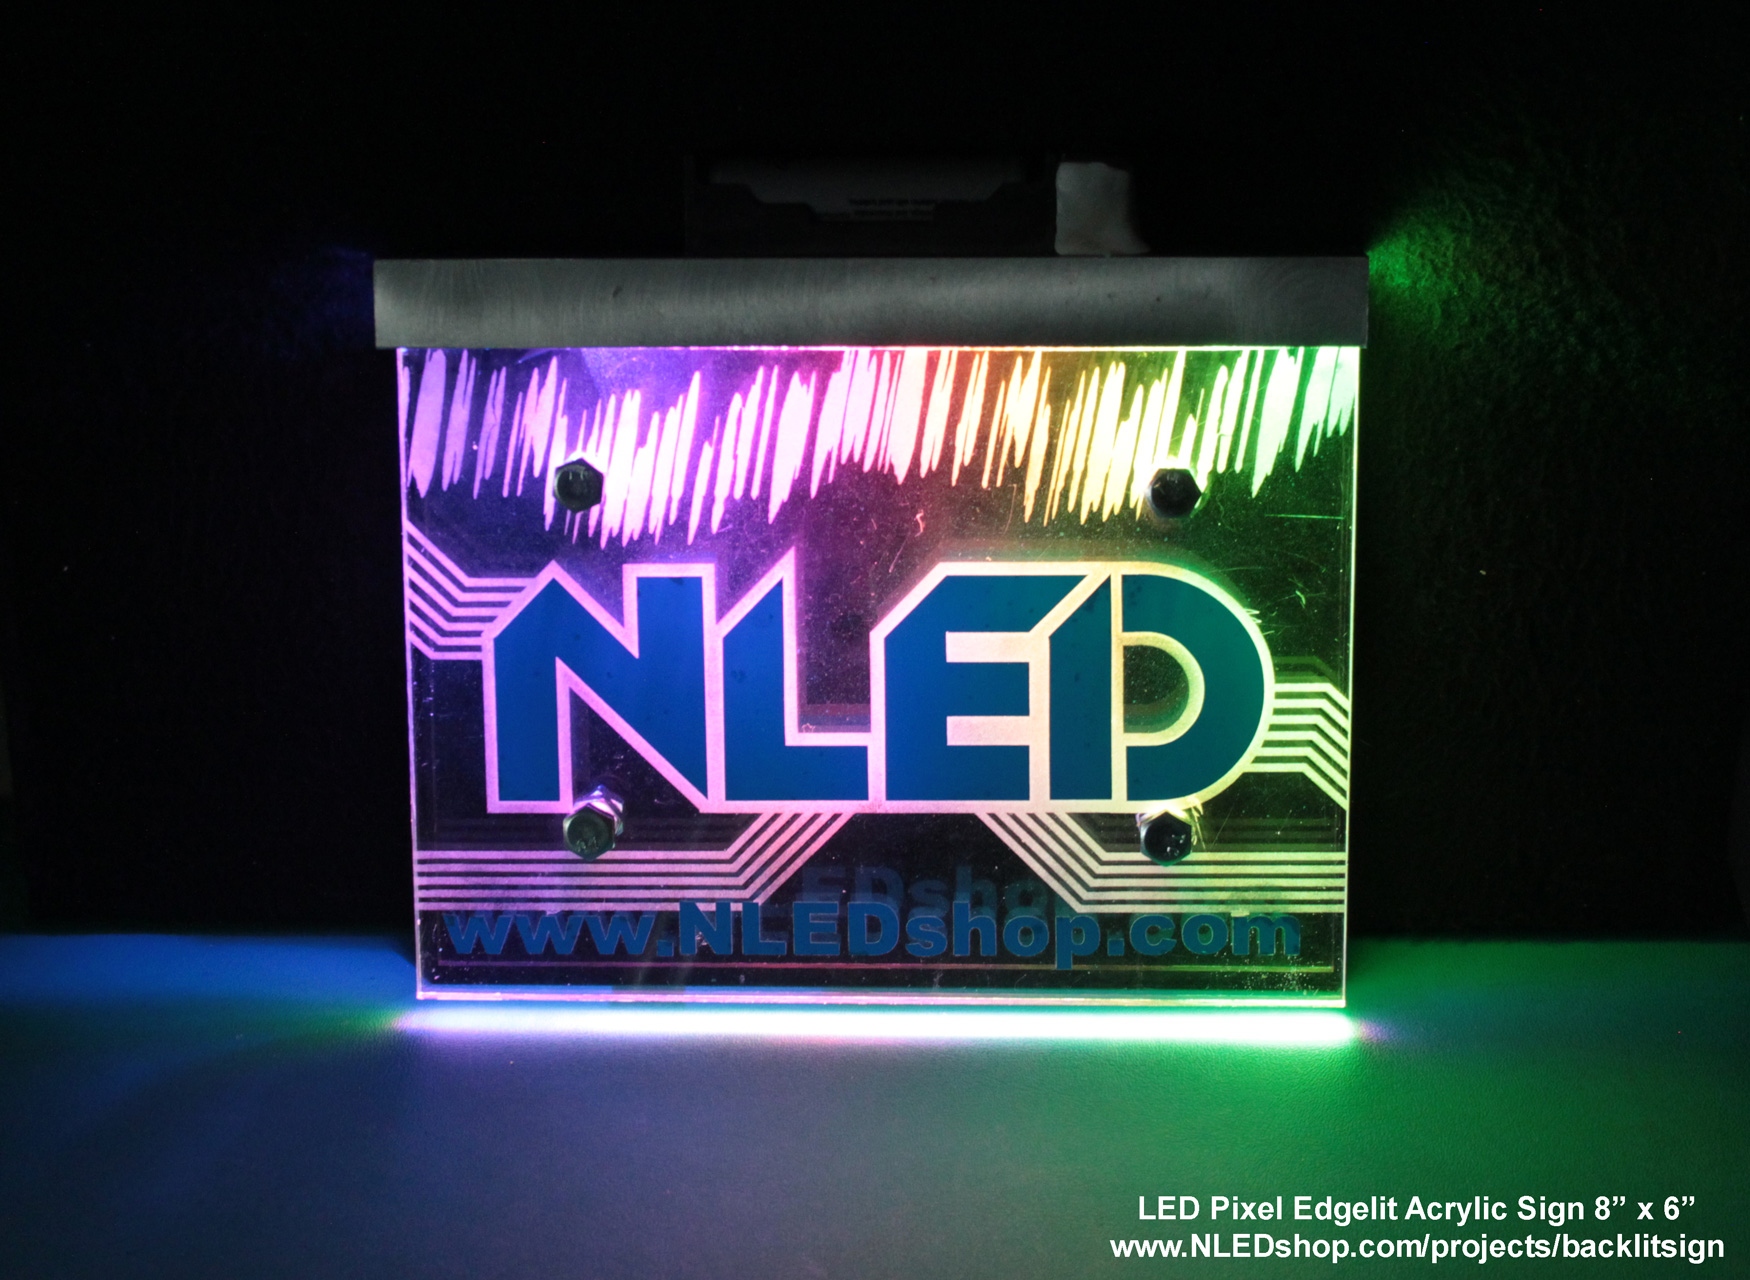 LED Pixel Edge Lit Acrylic Sign - Electronic Design, LLC